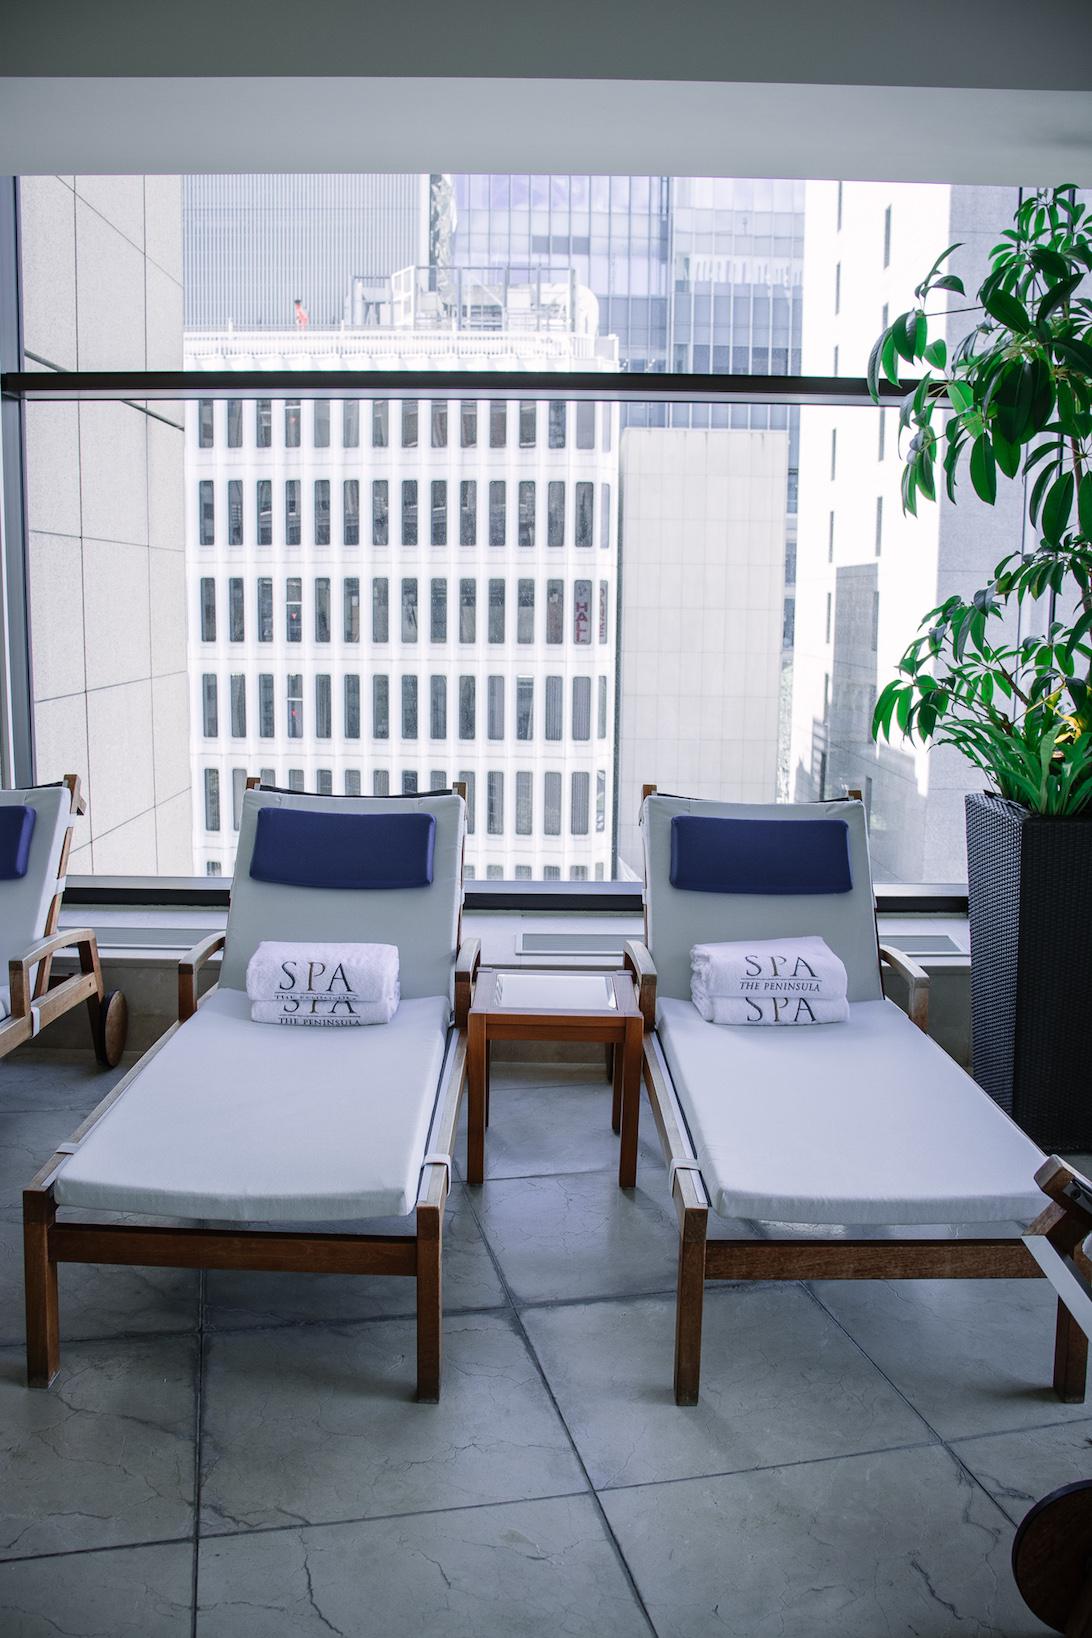 Peninsula Tokyo Hotel poolside chairs